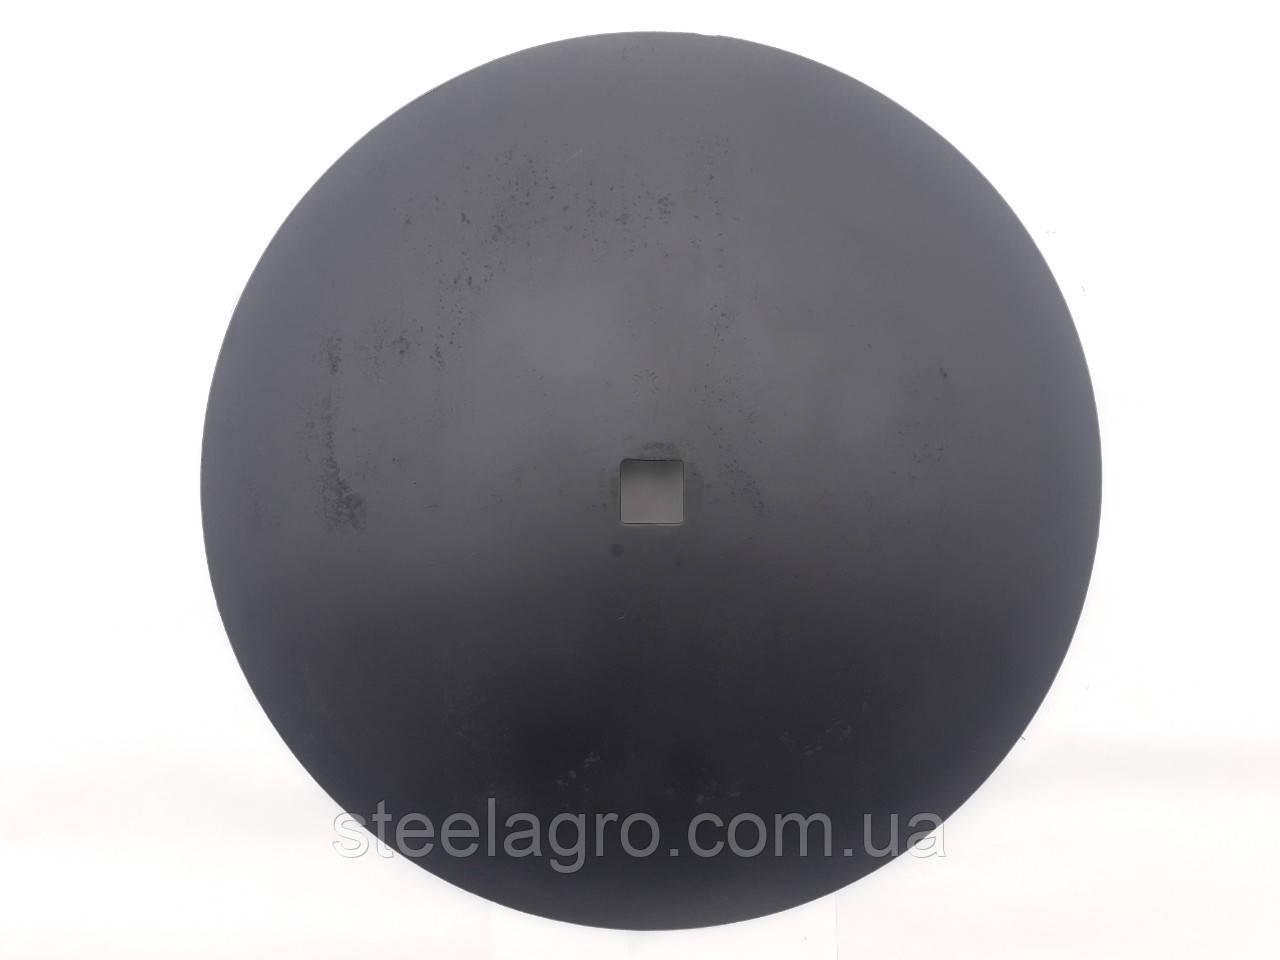 Диск бороны D=660 мм, кв41, h=7мм гладкий ст30MnB5 (Gregoire Besson) Грегуар бессон арт. 851005298